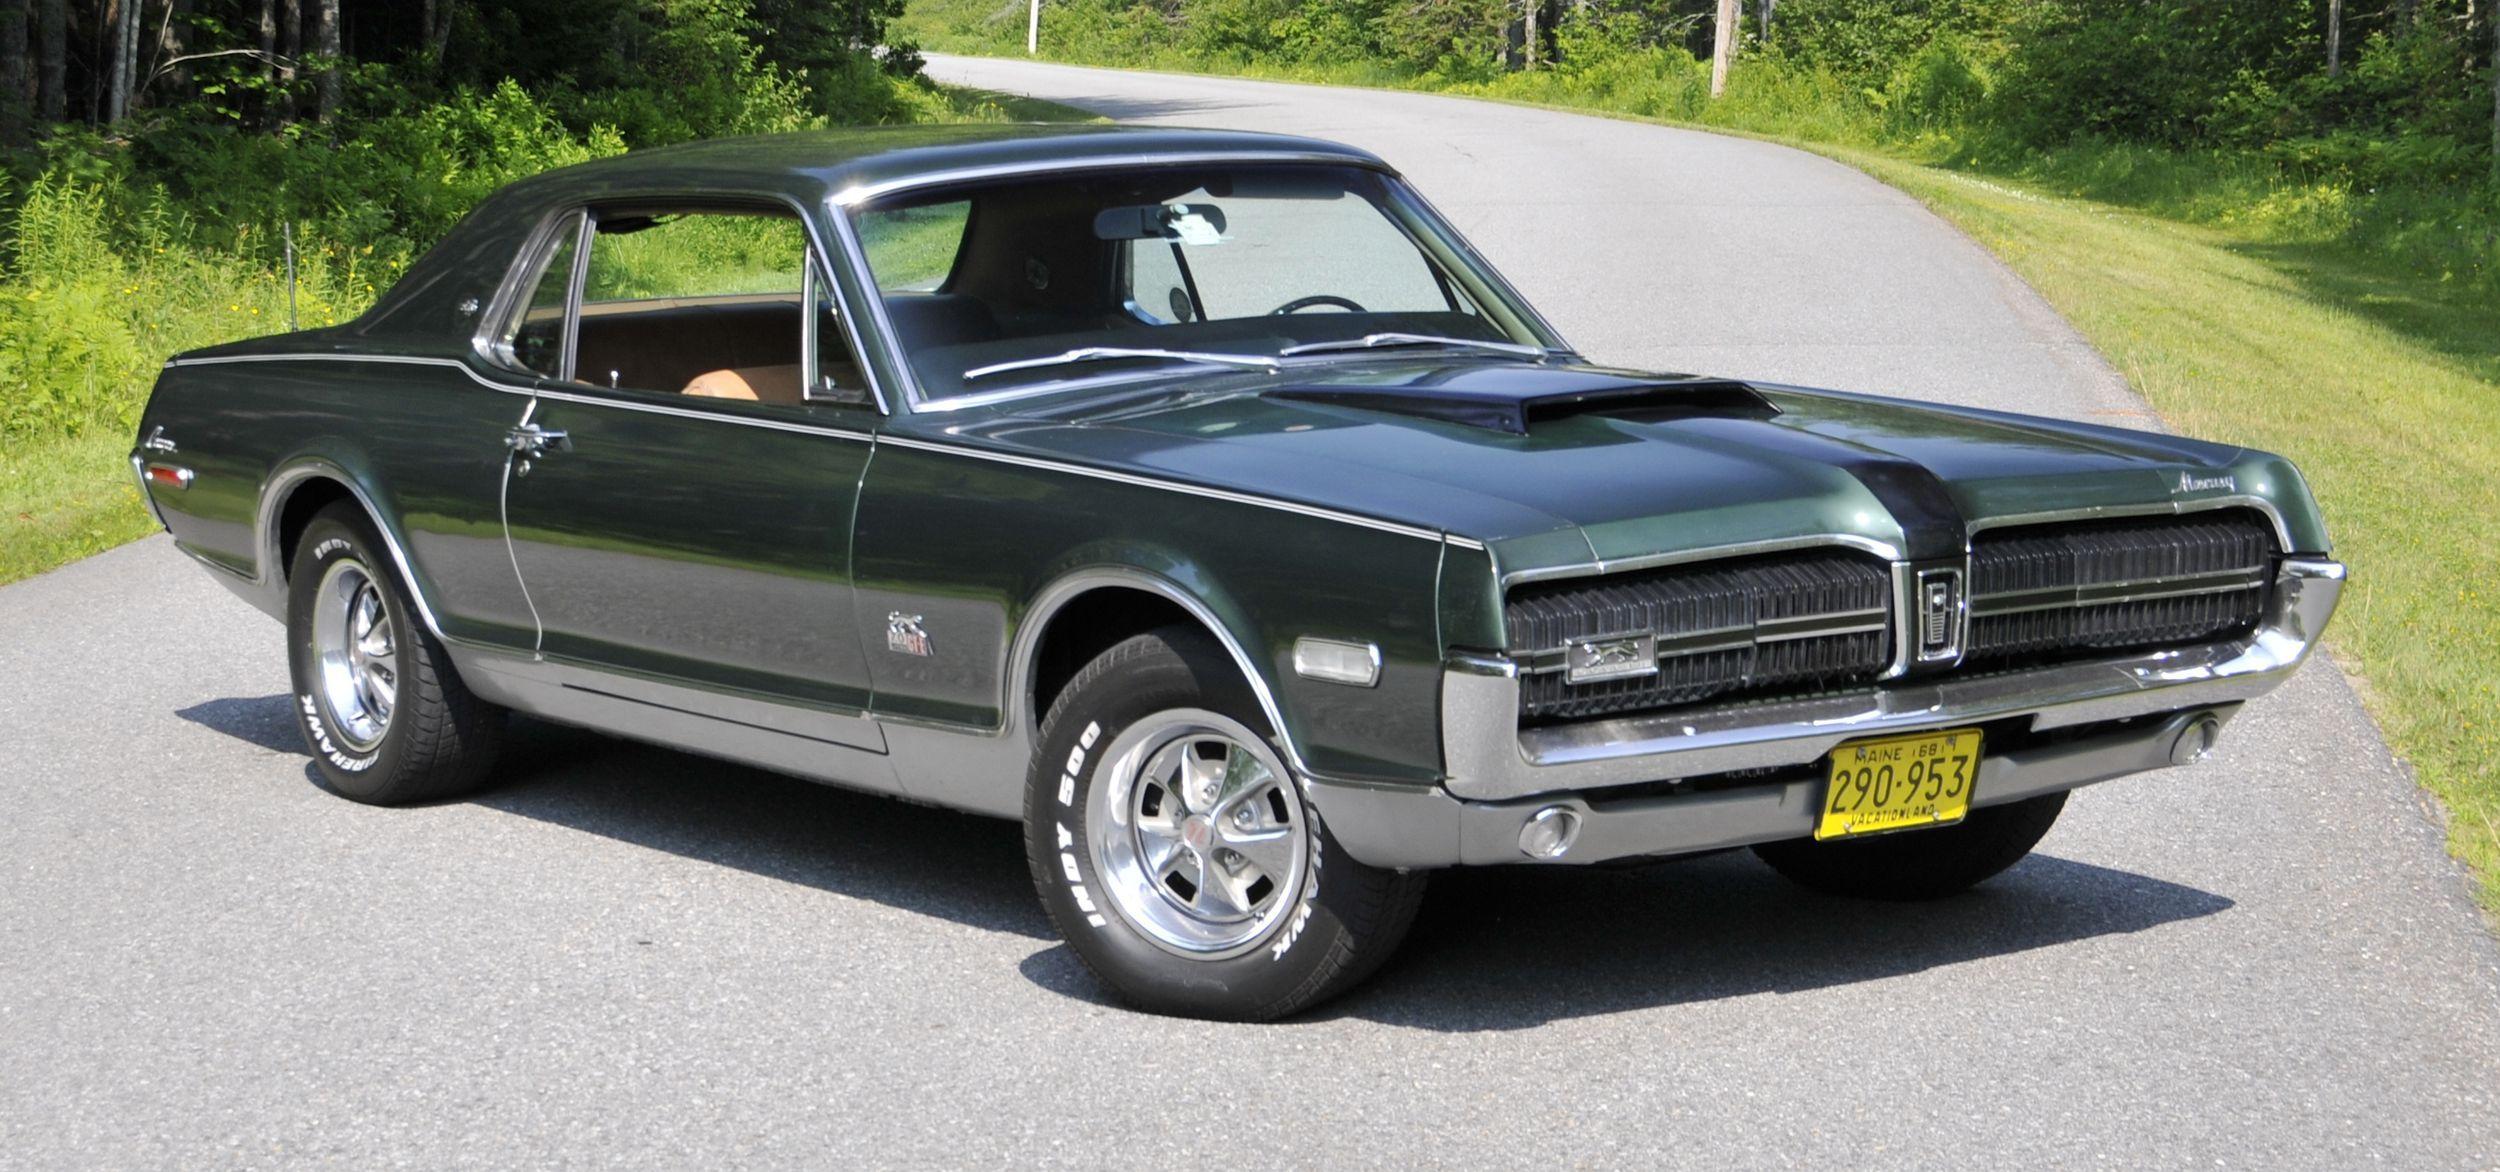 Rare cat spotted in Maine: a 1968 Mercury Cougar XR-7 GT-E | Cars ...